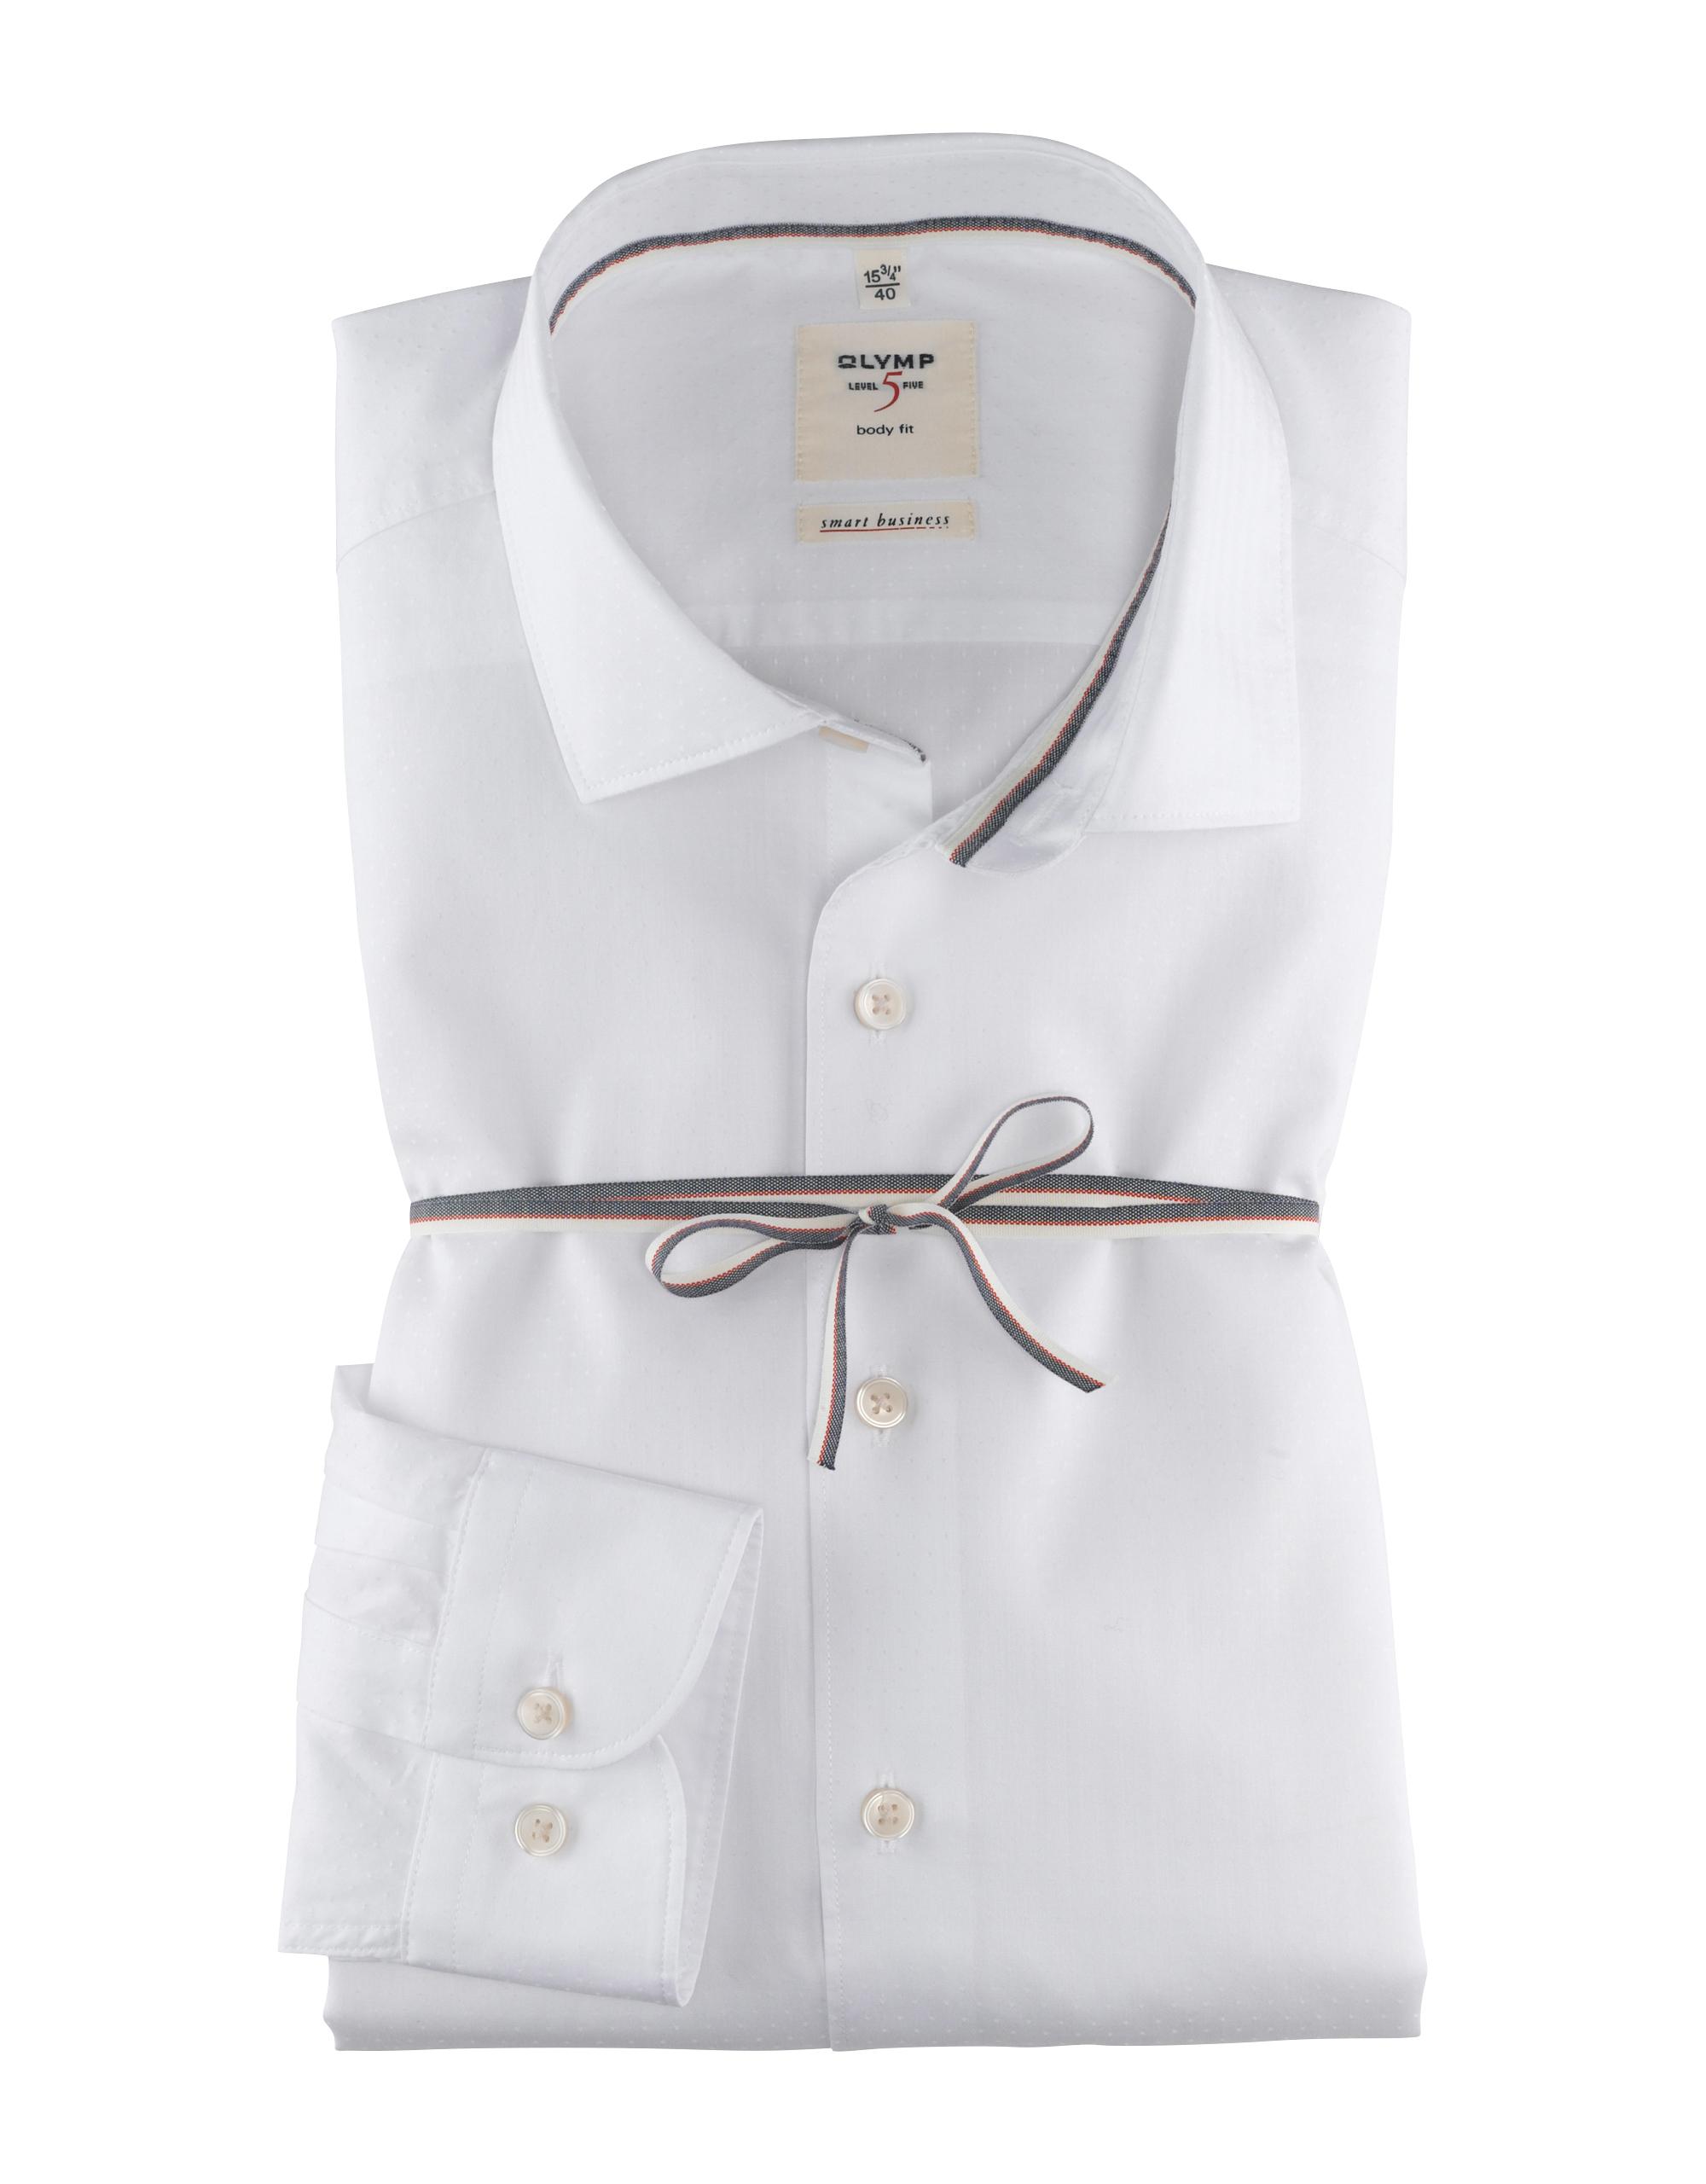 OLYMP Level Five Smart Business Hemd, body fit, Kent, Weiß, 39   Bekleidung > Hemden > Business Hemden   Weiß   Baumwolle   OLYMP